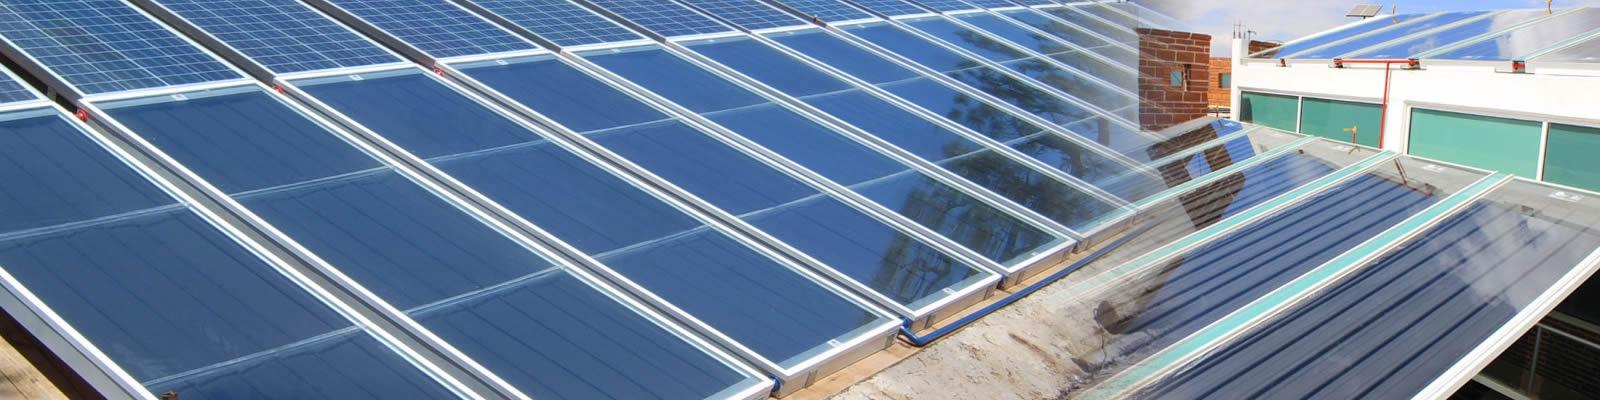 paneles_solares_de_agua